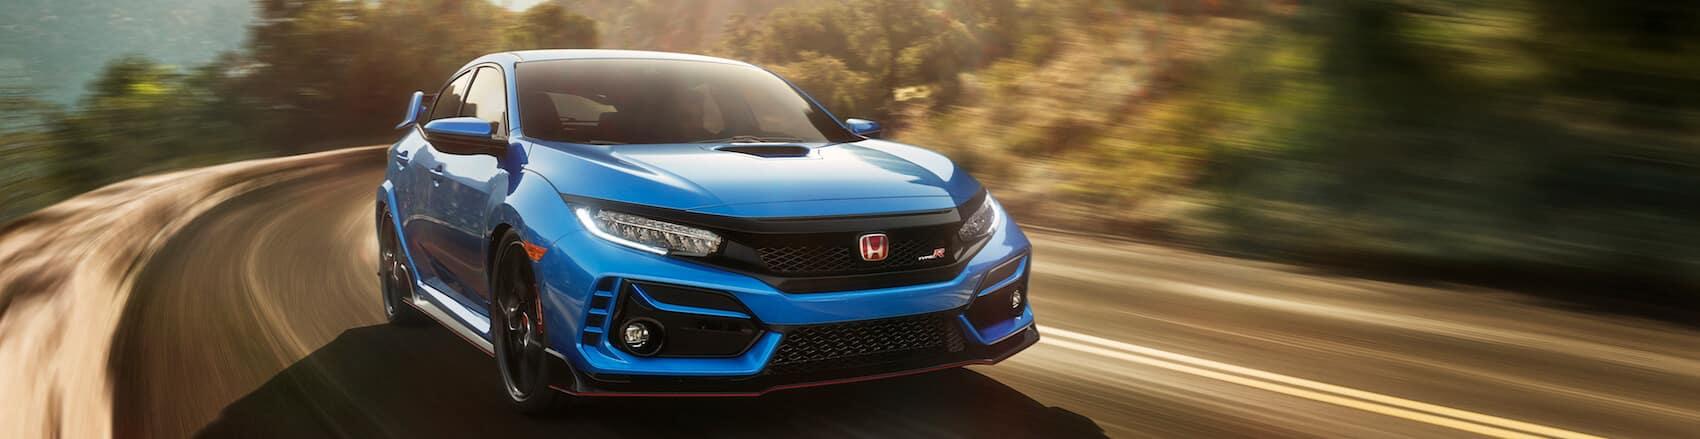 Honda Civic specials near Venice, FL